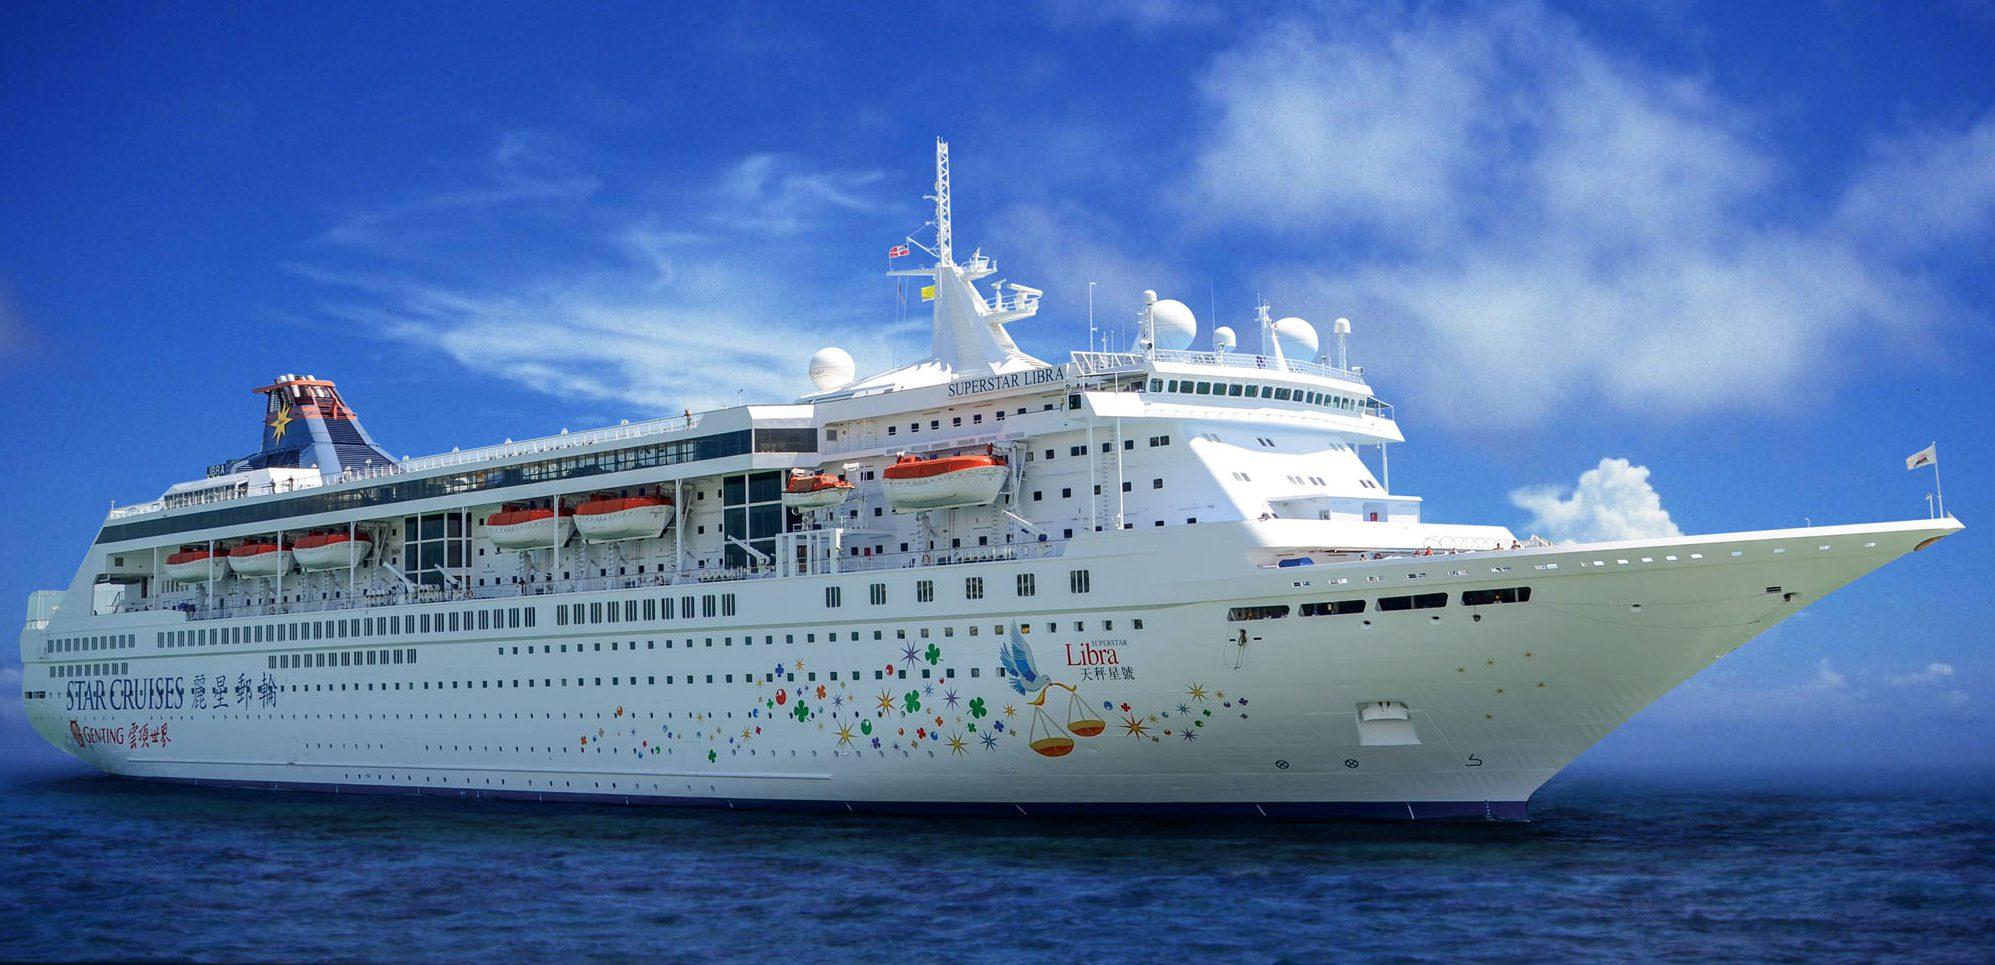 Star Cruises Superstar Libra Returns To Penang Homeport